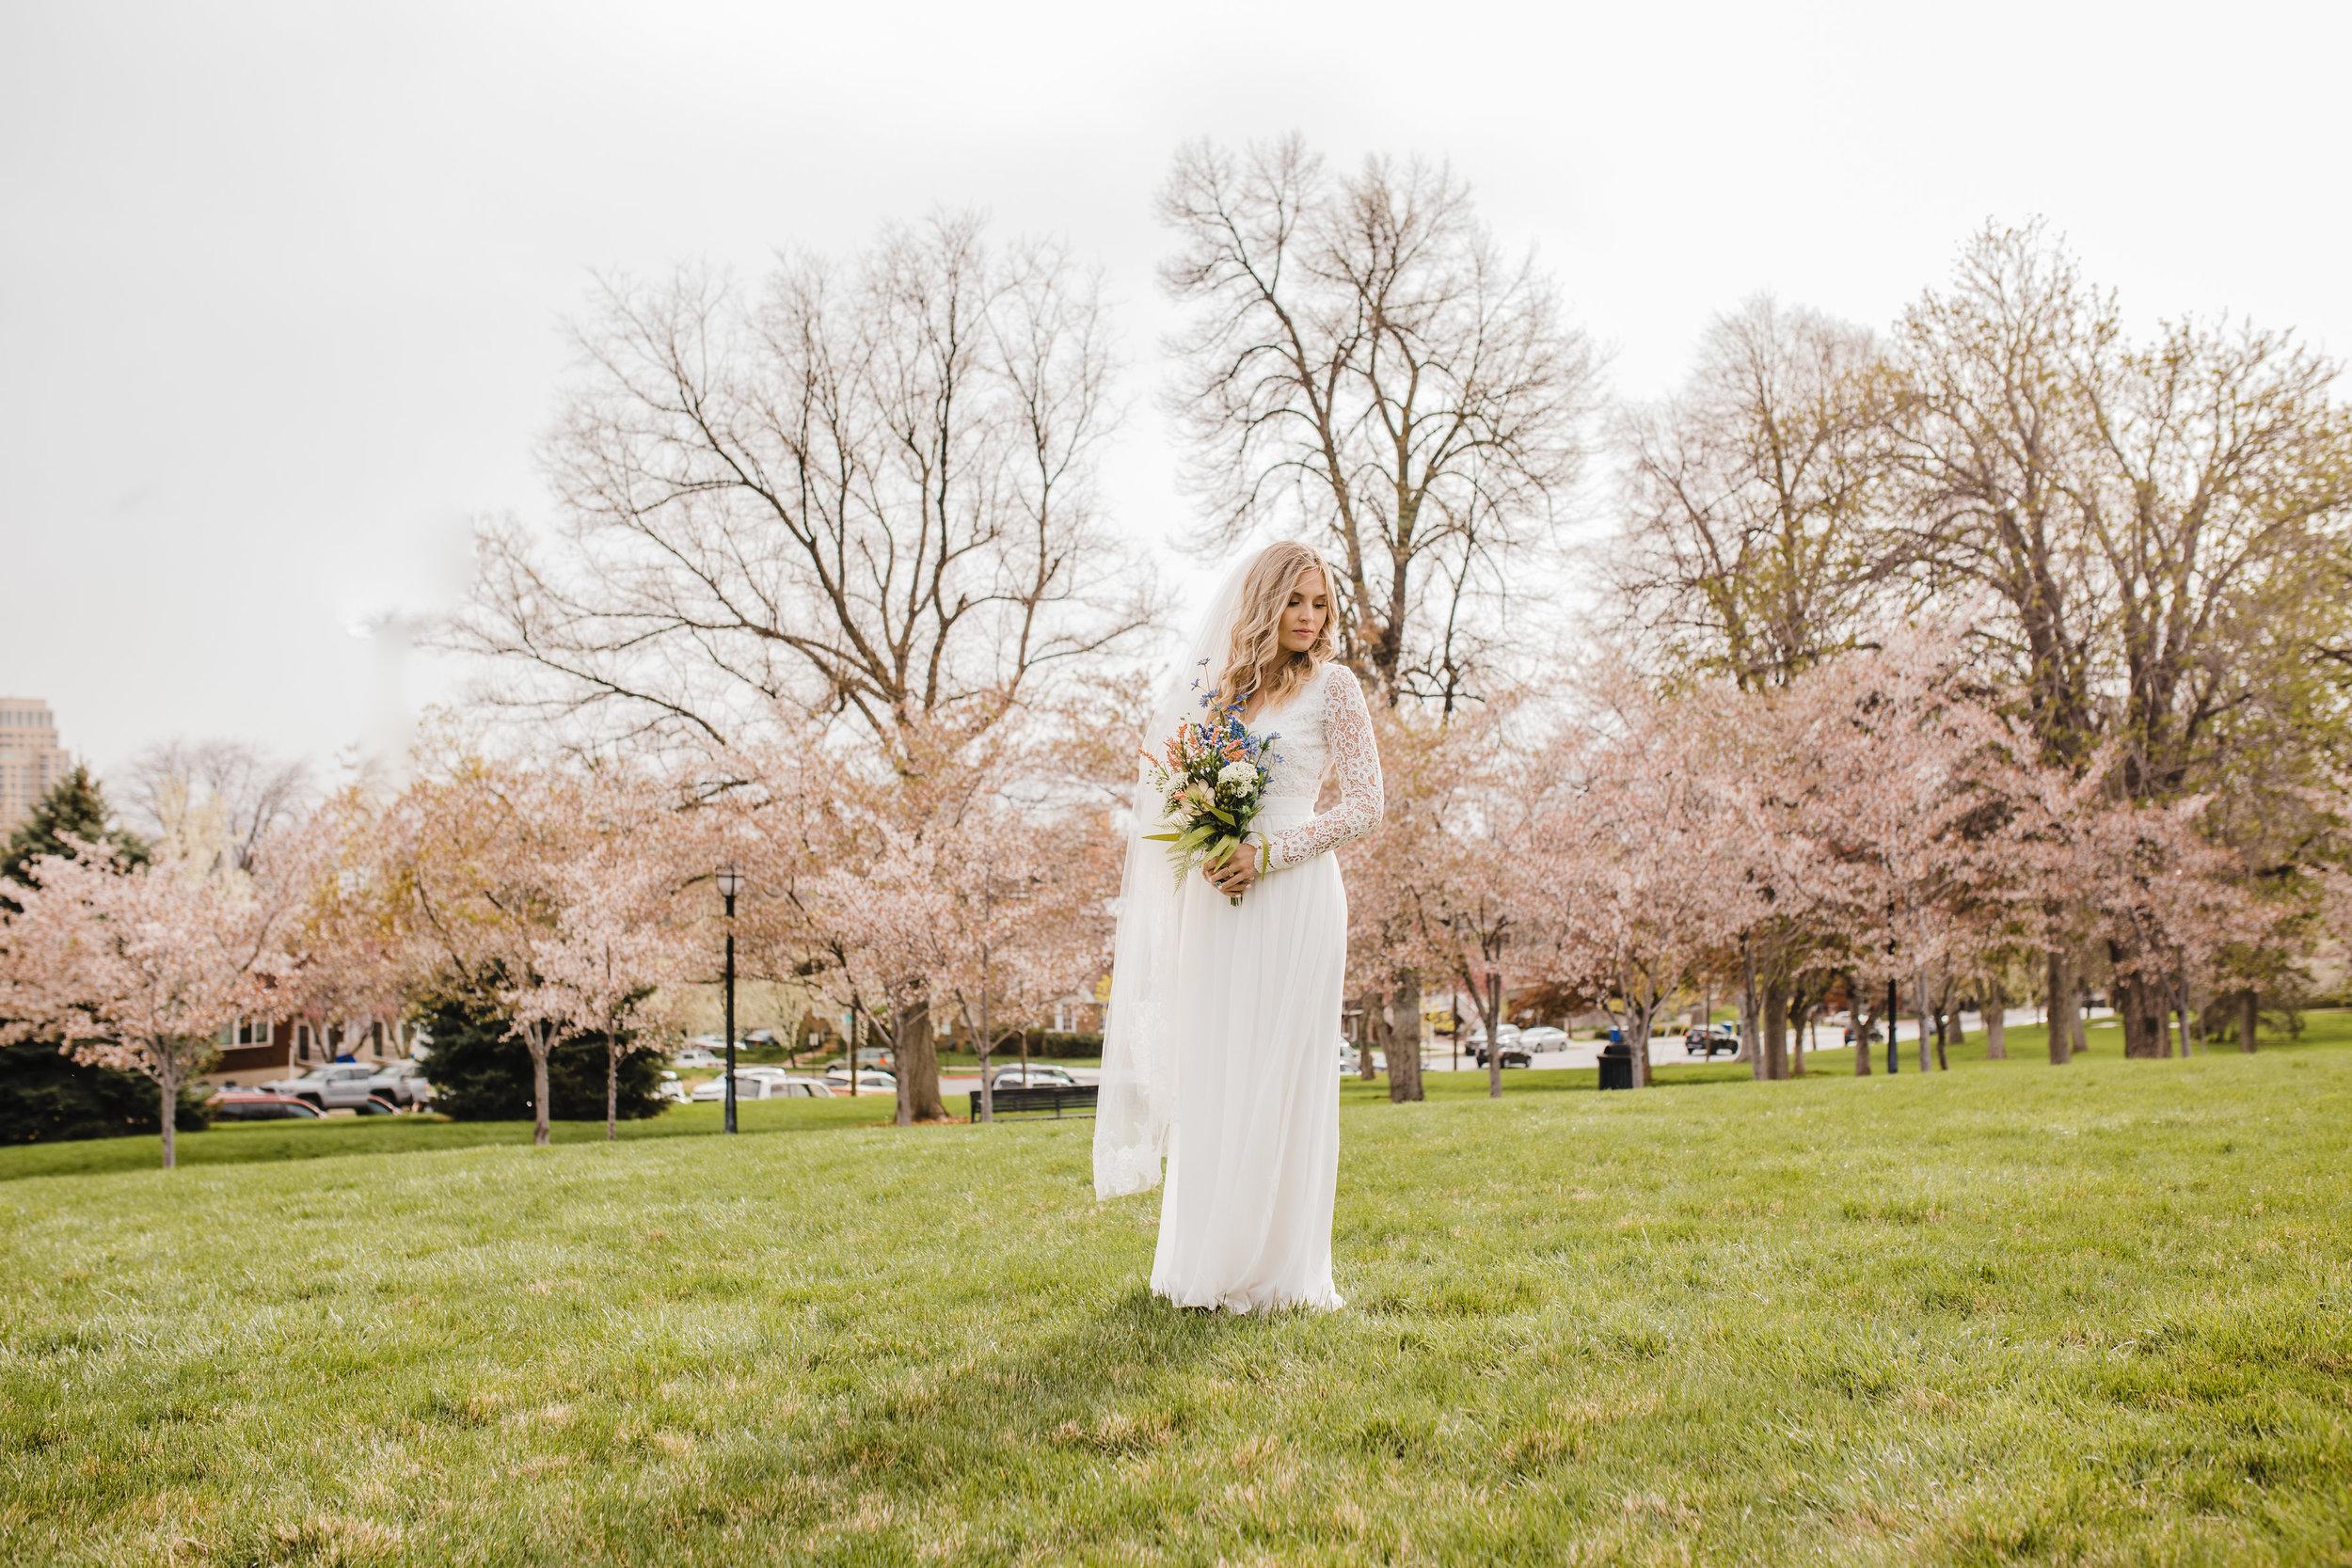 professional wedding photographer in park city utah bohemian flower bouquet spring wedding pink cherry blossoms lace wedding dress